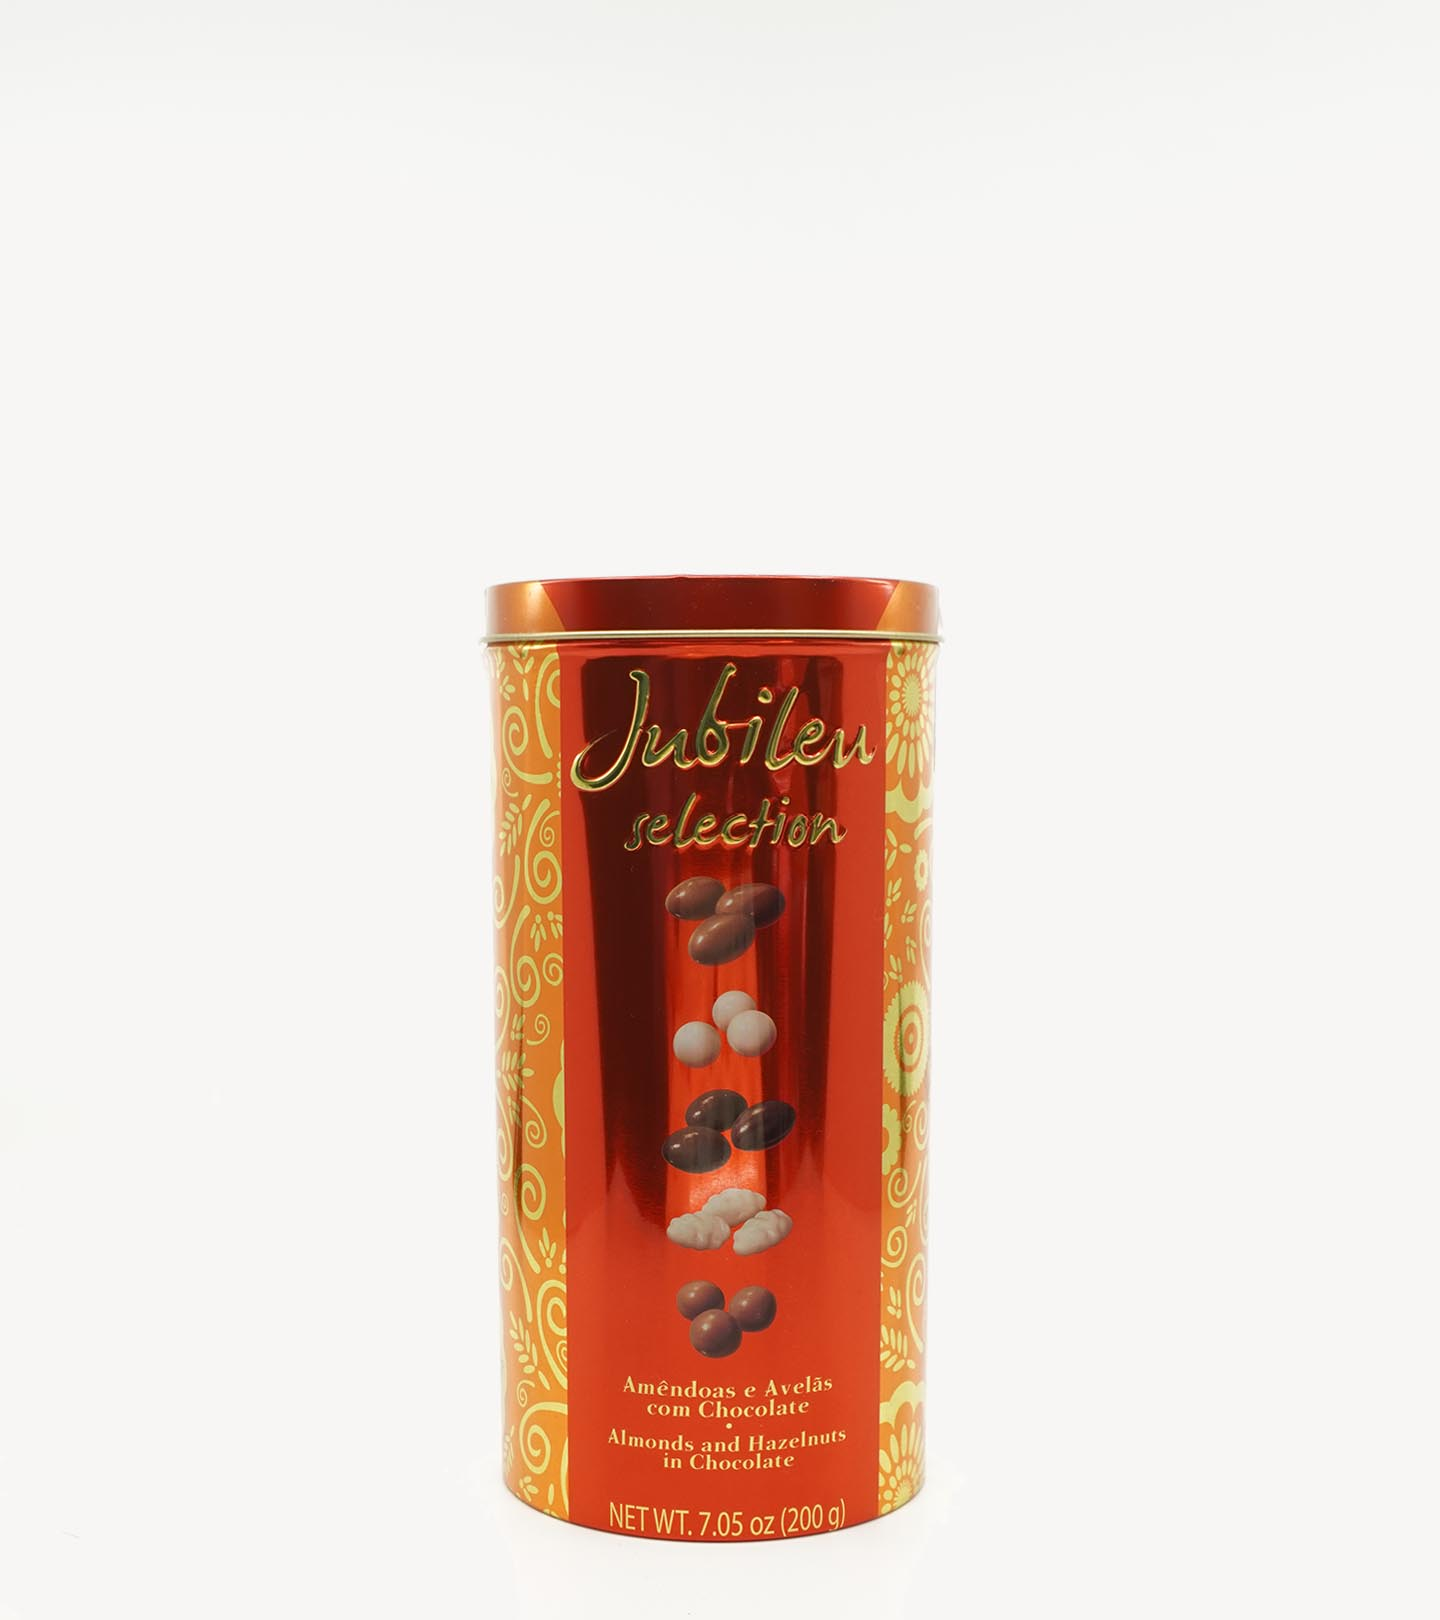 Amêndoas e Avelãs c/ Chocolate Jubileu Selection Lata 200g